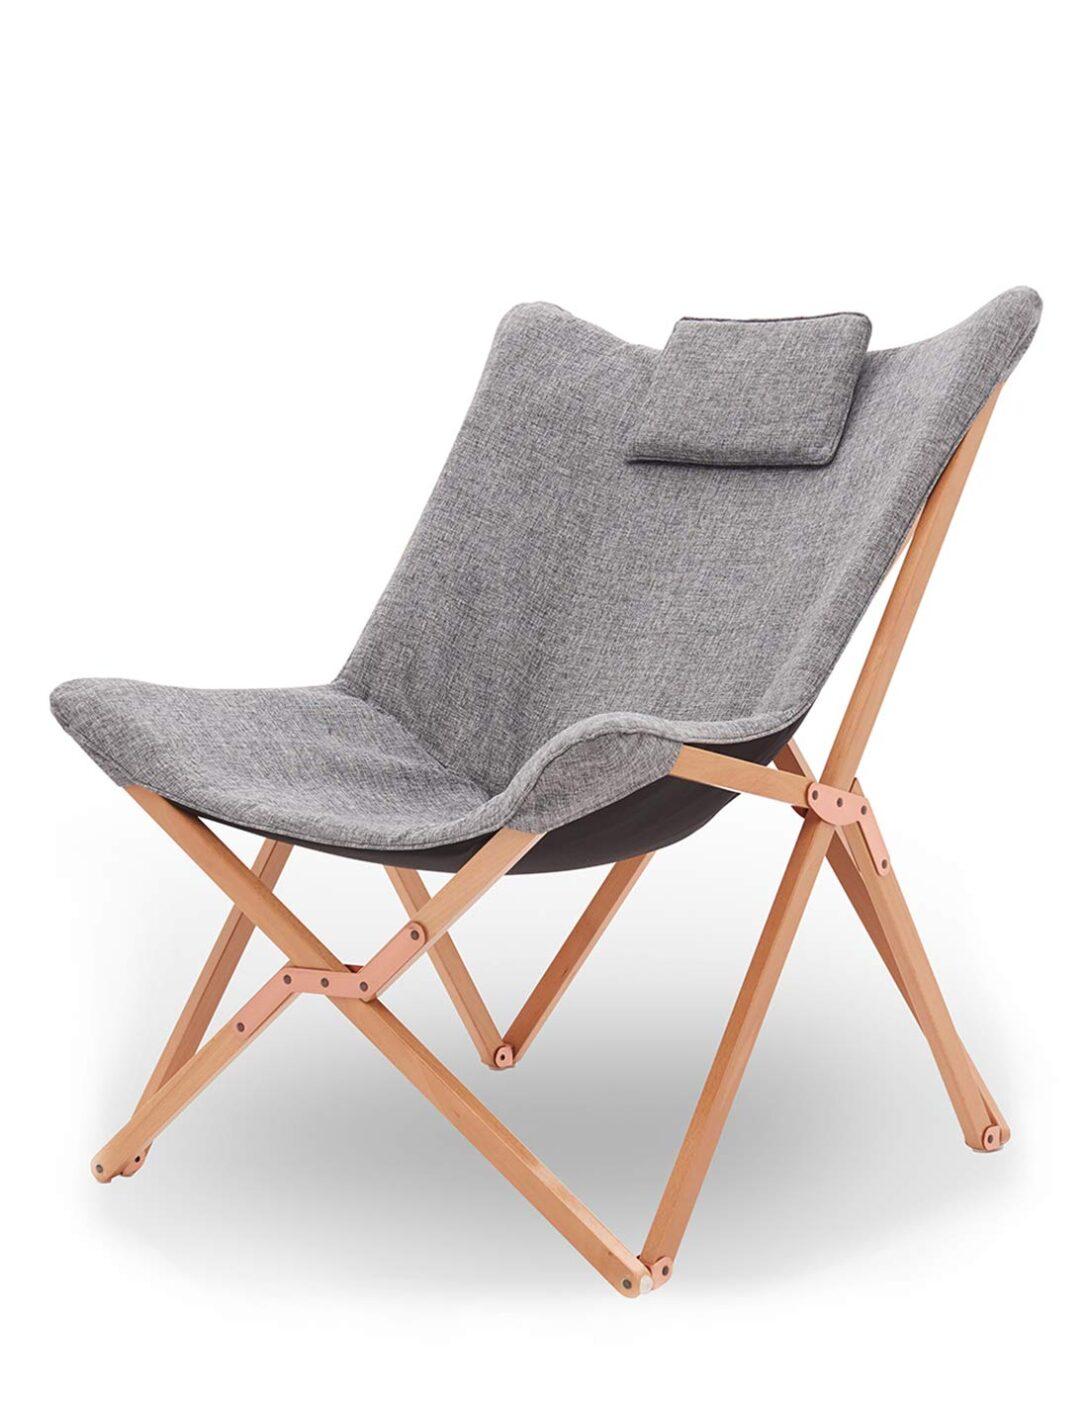 Large Size of Lounge Klappstuhl Amazonde Suhu Camping Stuhl Sessel Modern Möbel Garten Loungemöbel Günstig Holz Sofa Set Wohnzimmer Lounge Klappstuhl